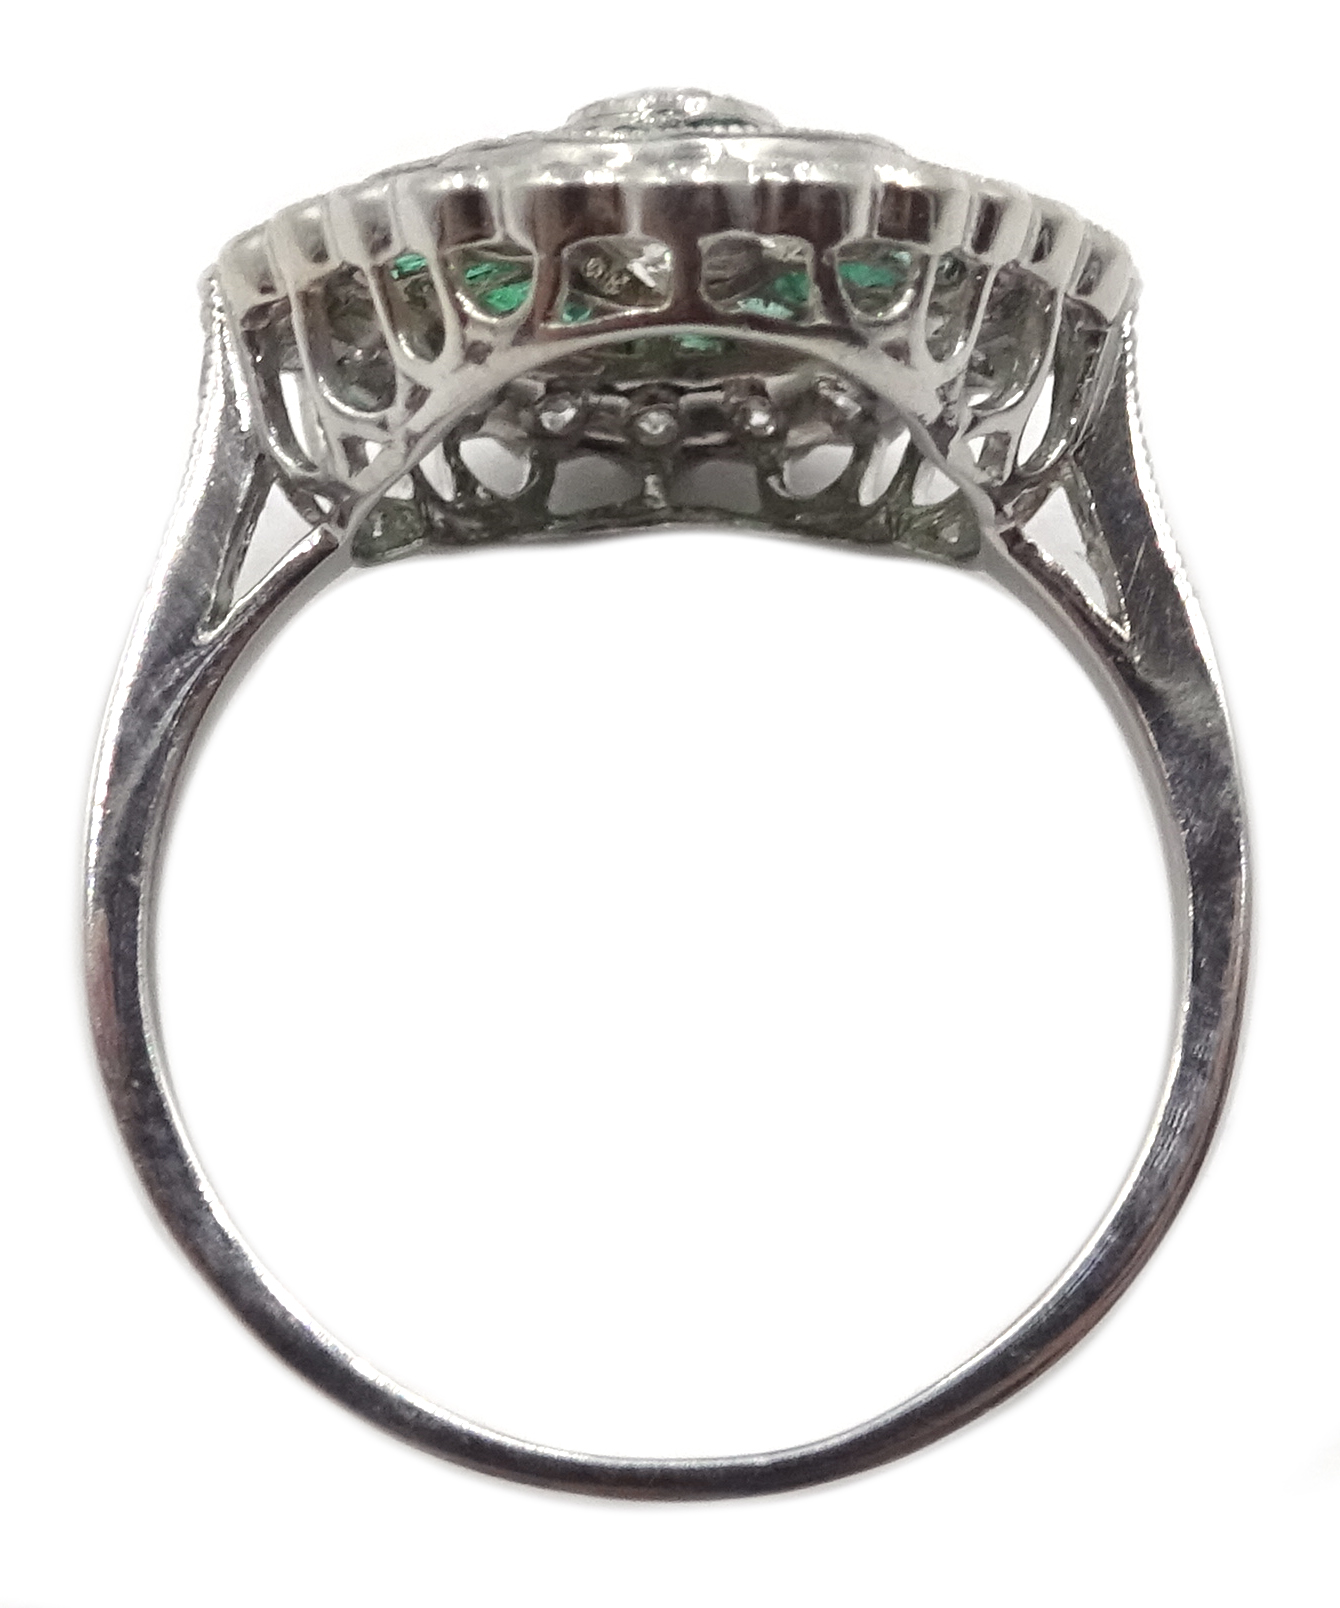 Lot 1057 - Platinum (tested) round brilliant cut diamond and calibre cut emerald ring,